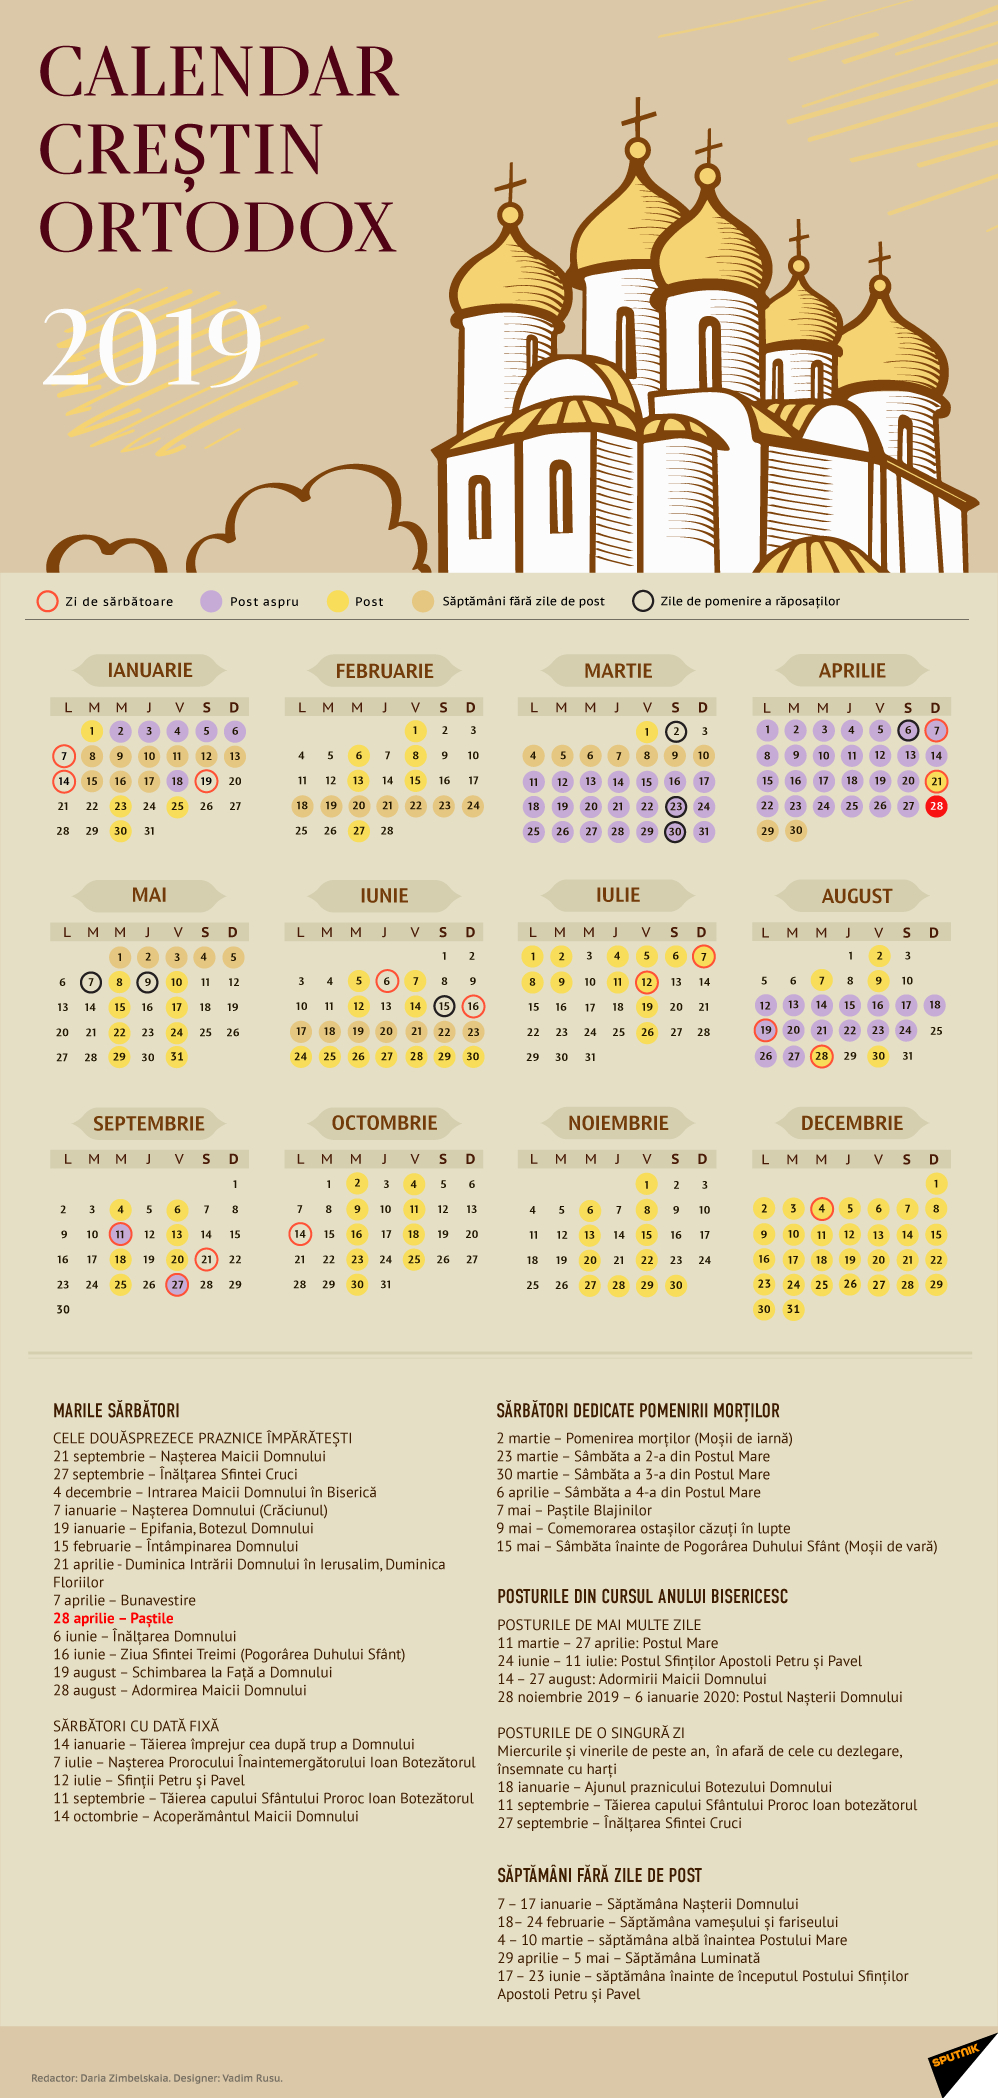 Calendar Creștin Ortodox 2019 - Stil Vechi Calendar 0Rtodox 2019